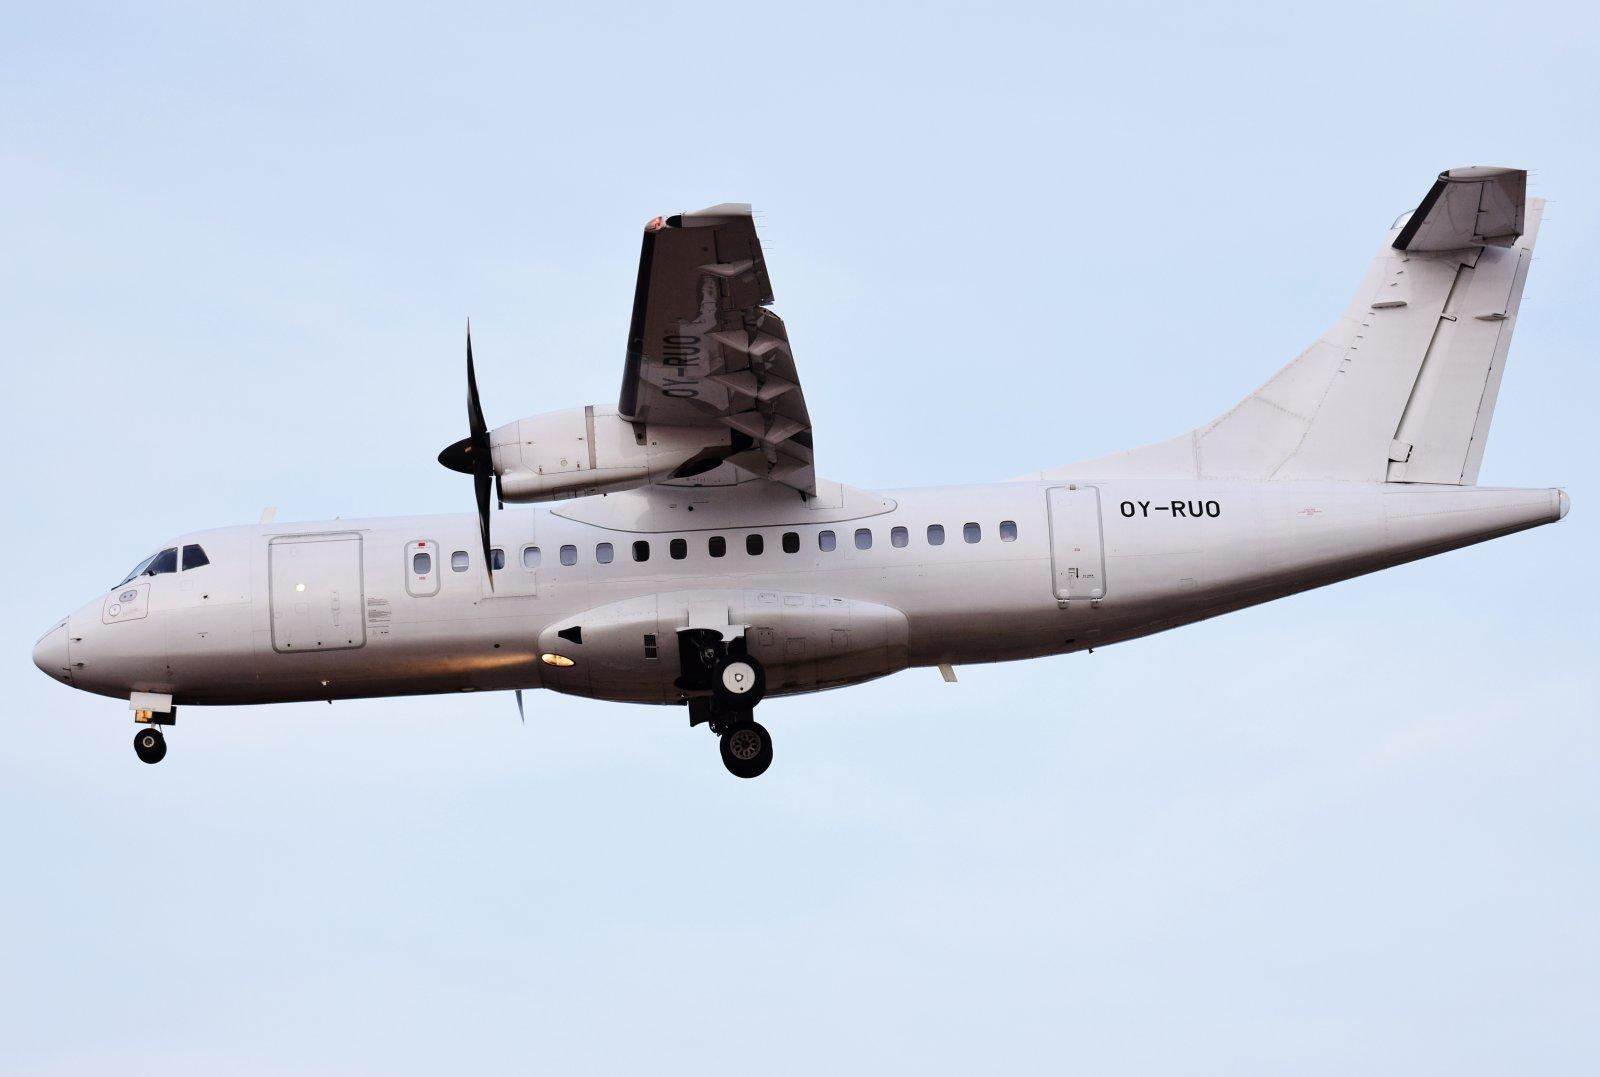 OY-RUO - ATR 42-500 - Danish Air Transport - 18.4.2019